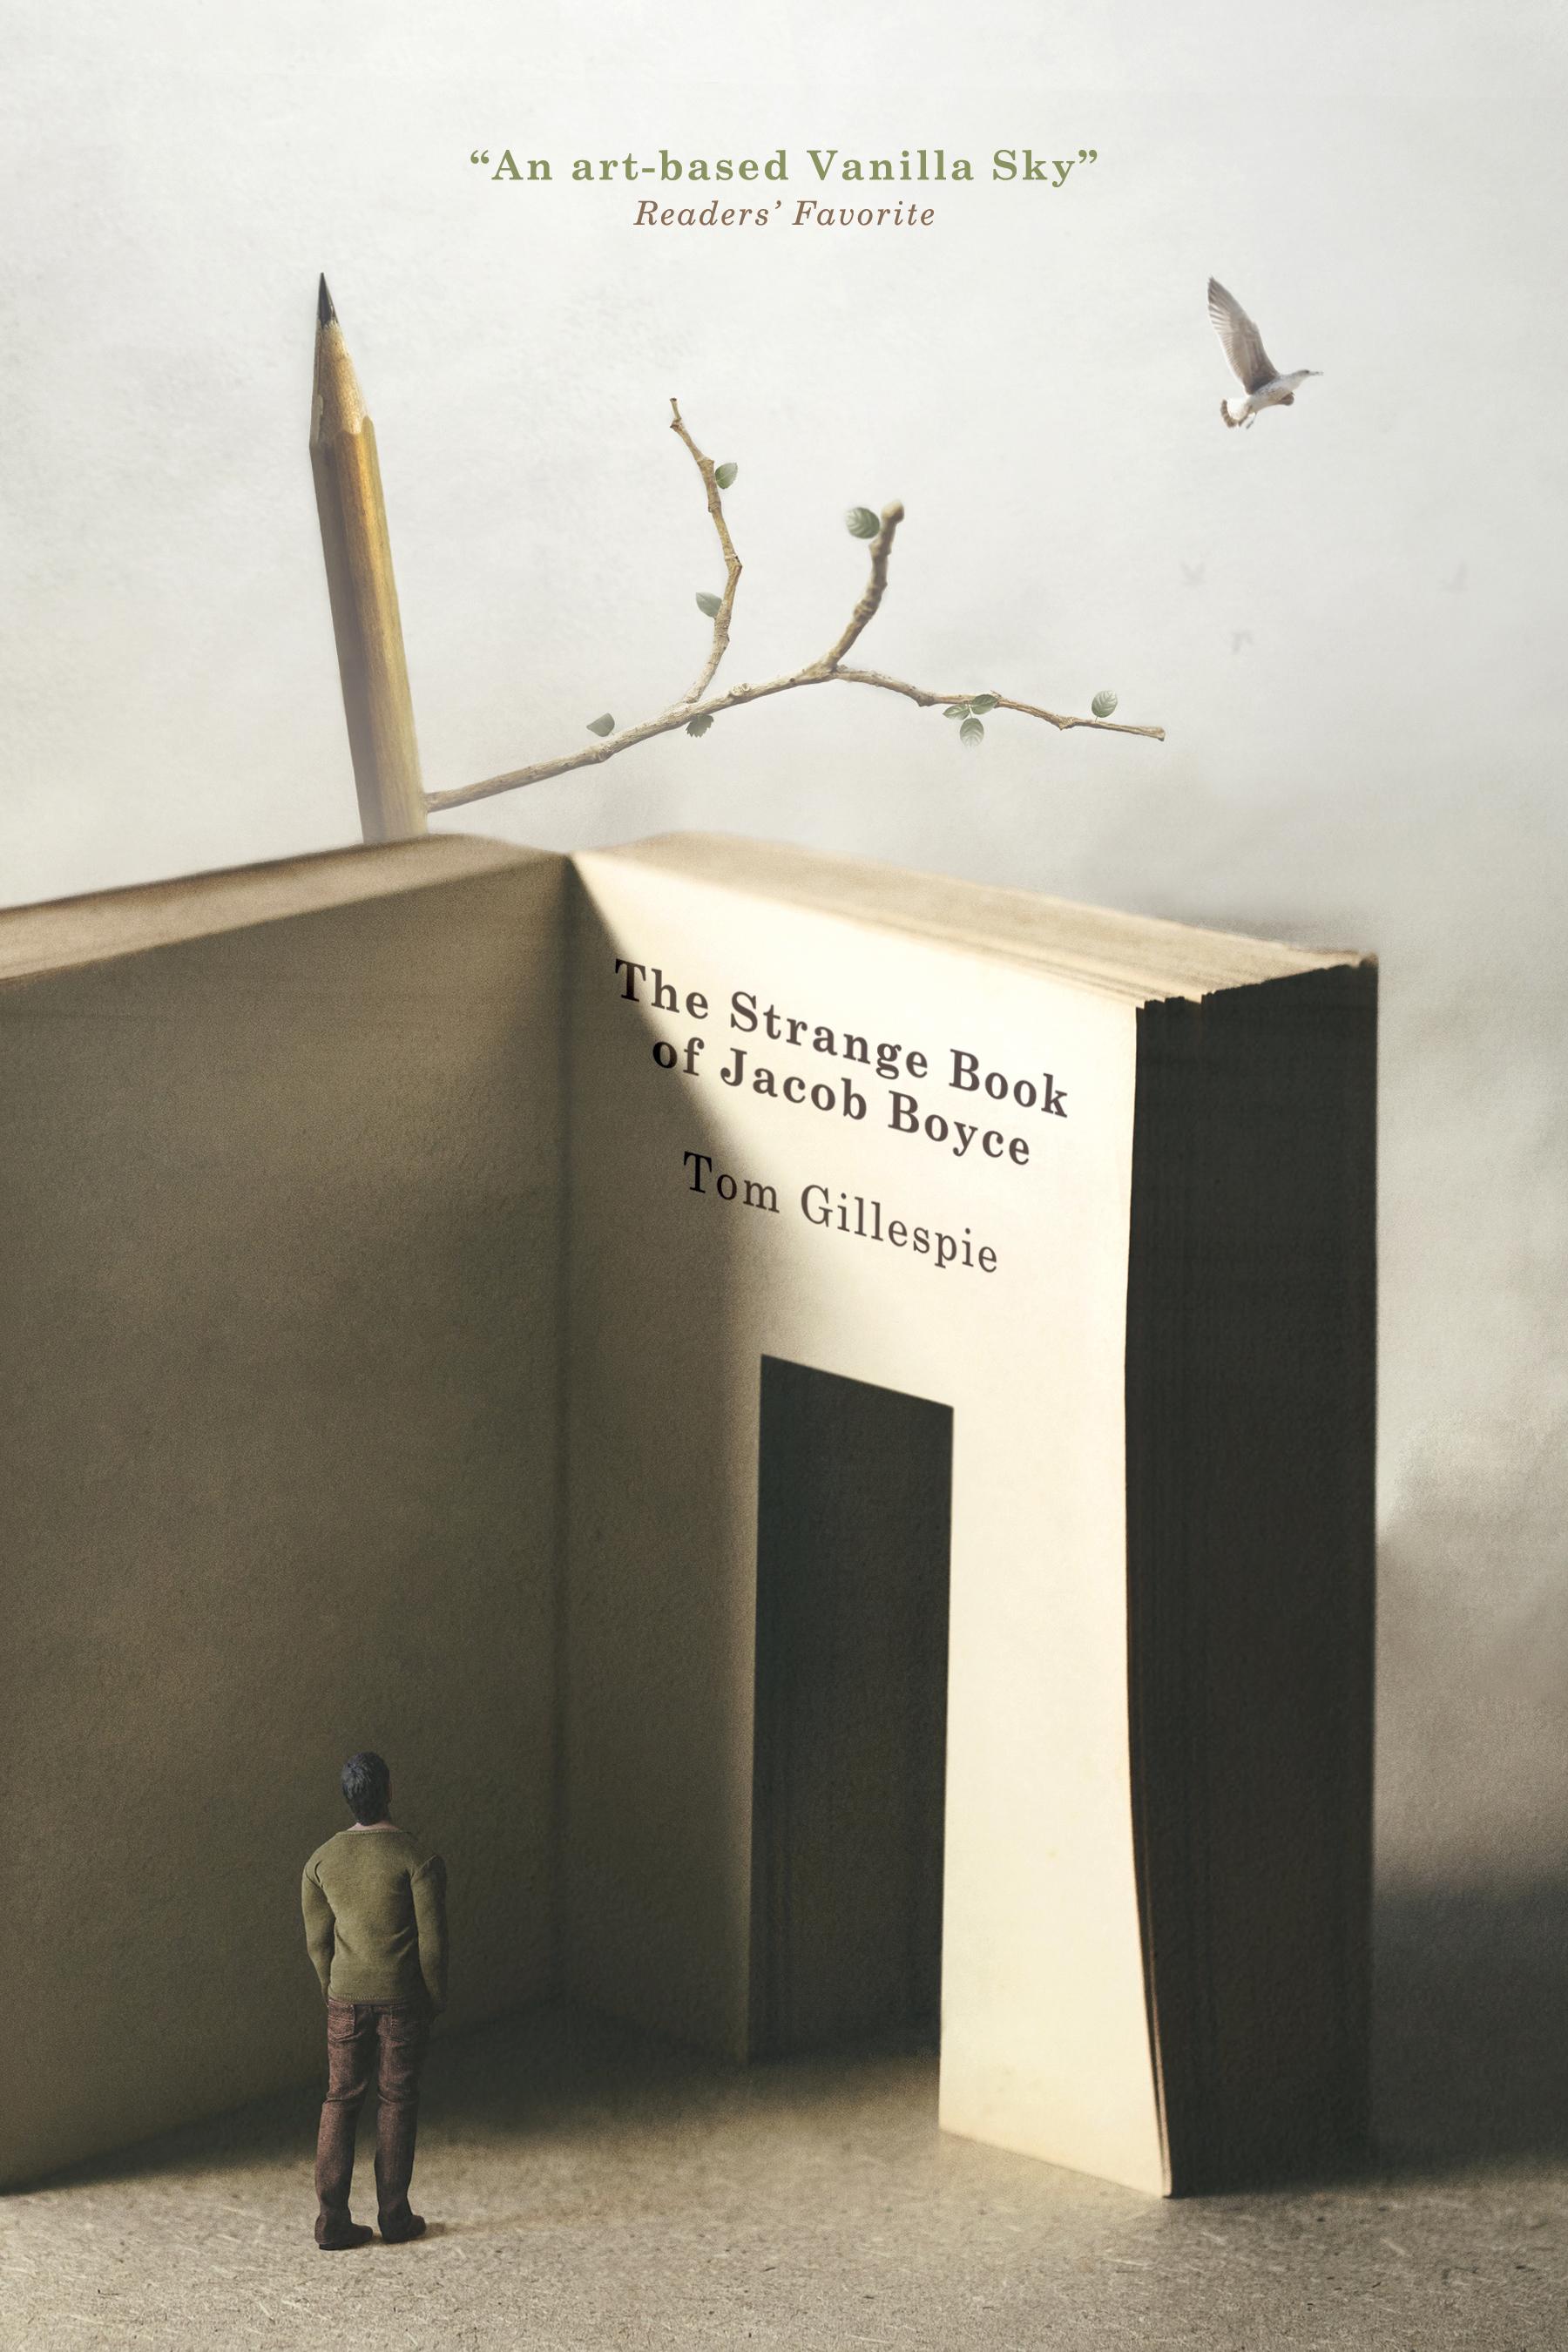 The Strange Book of Jacob Boyce by Tom Gillespie